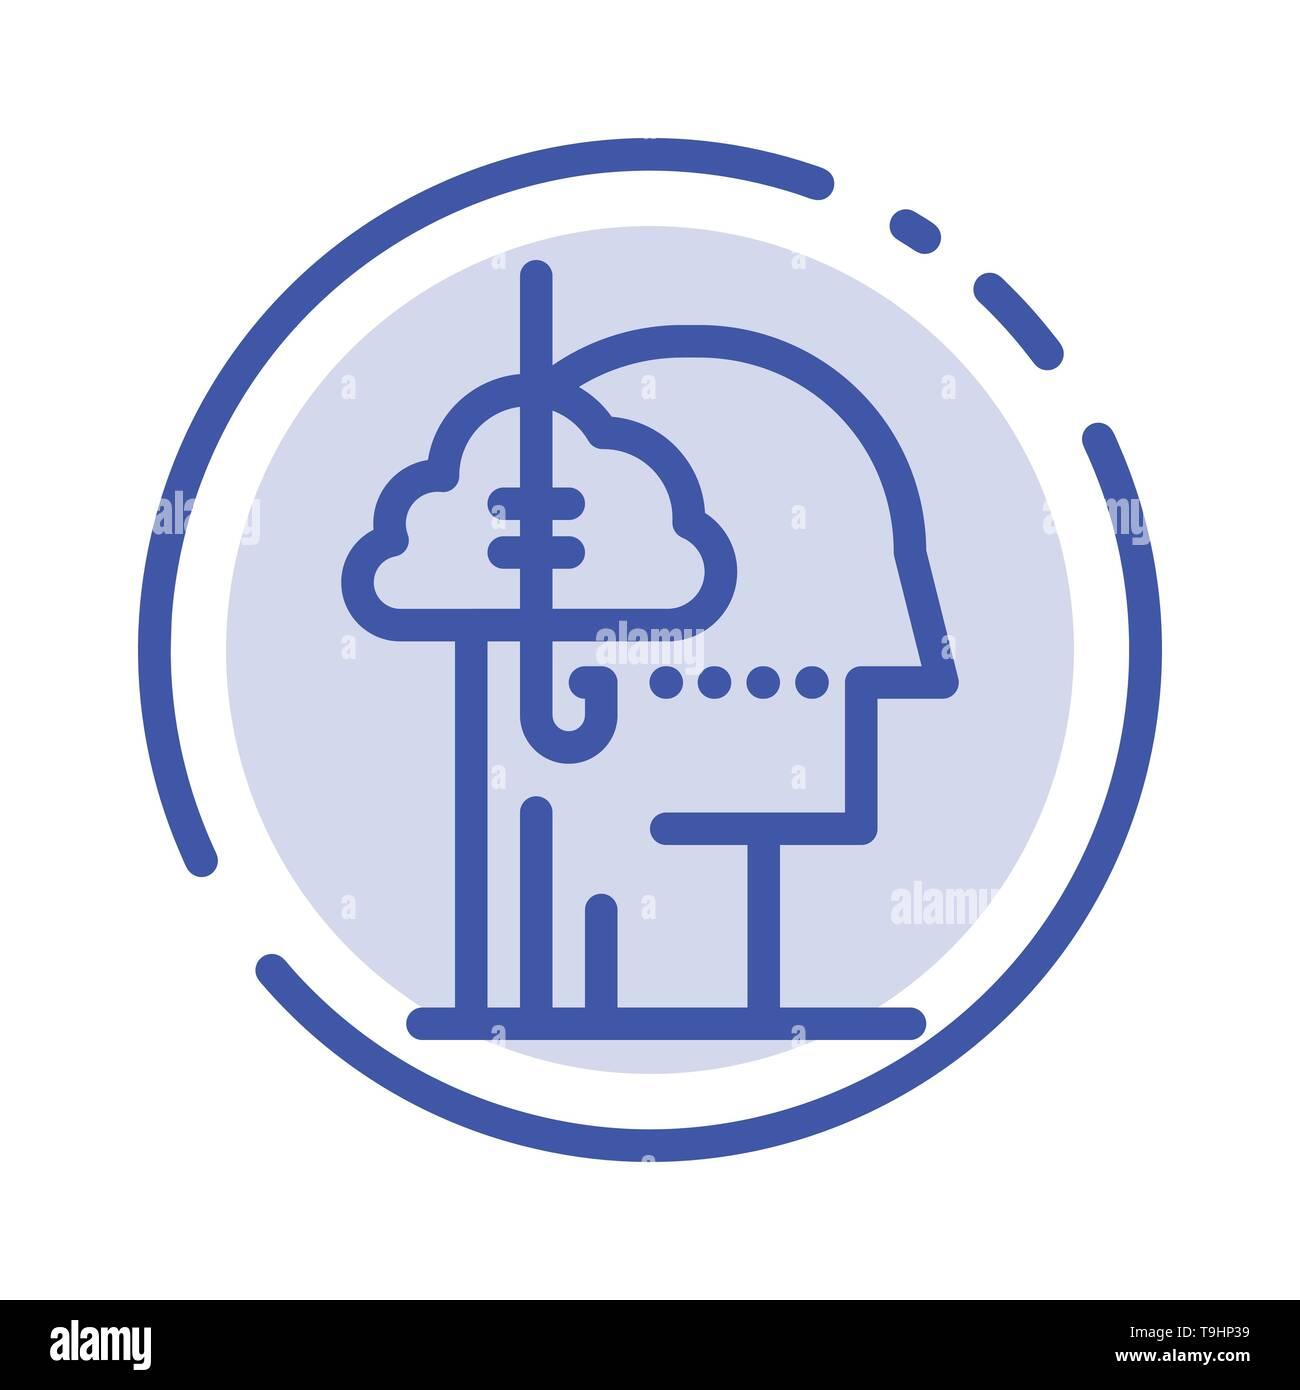 Borrowing Ideas, Addiction, Catch, Habit, Human Blue Dotted Line Line Icon - Stock Image